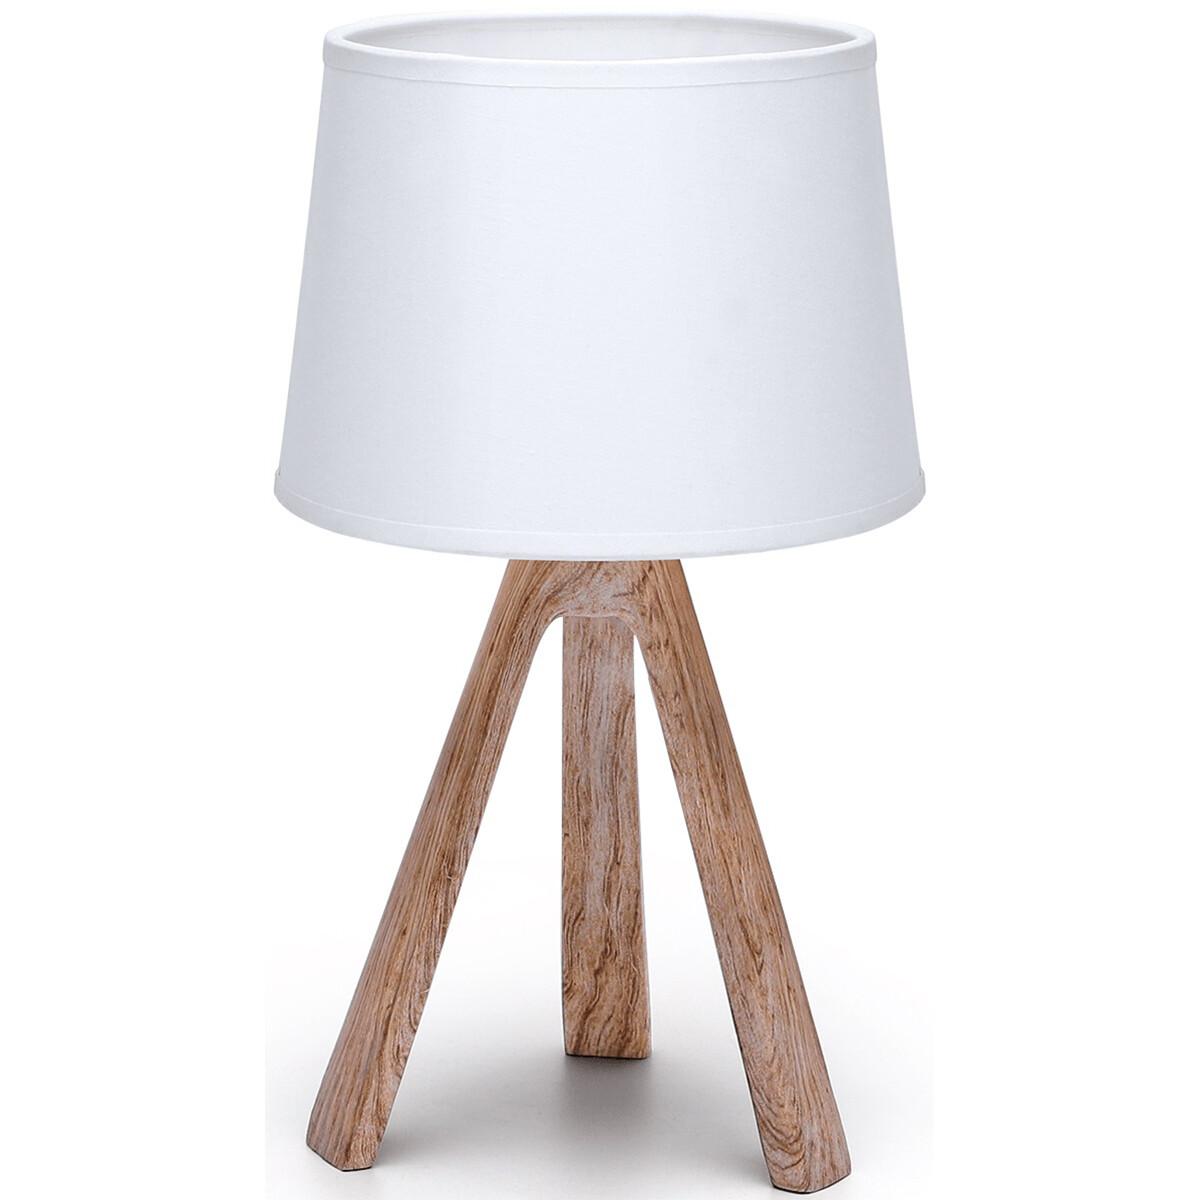 LED Tafellamp - Tafelverlichting - Aigi Linmo - E14 Fitting - Rond - Mat Bruin - Kunststof